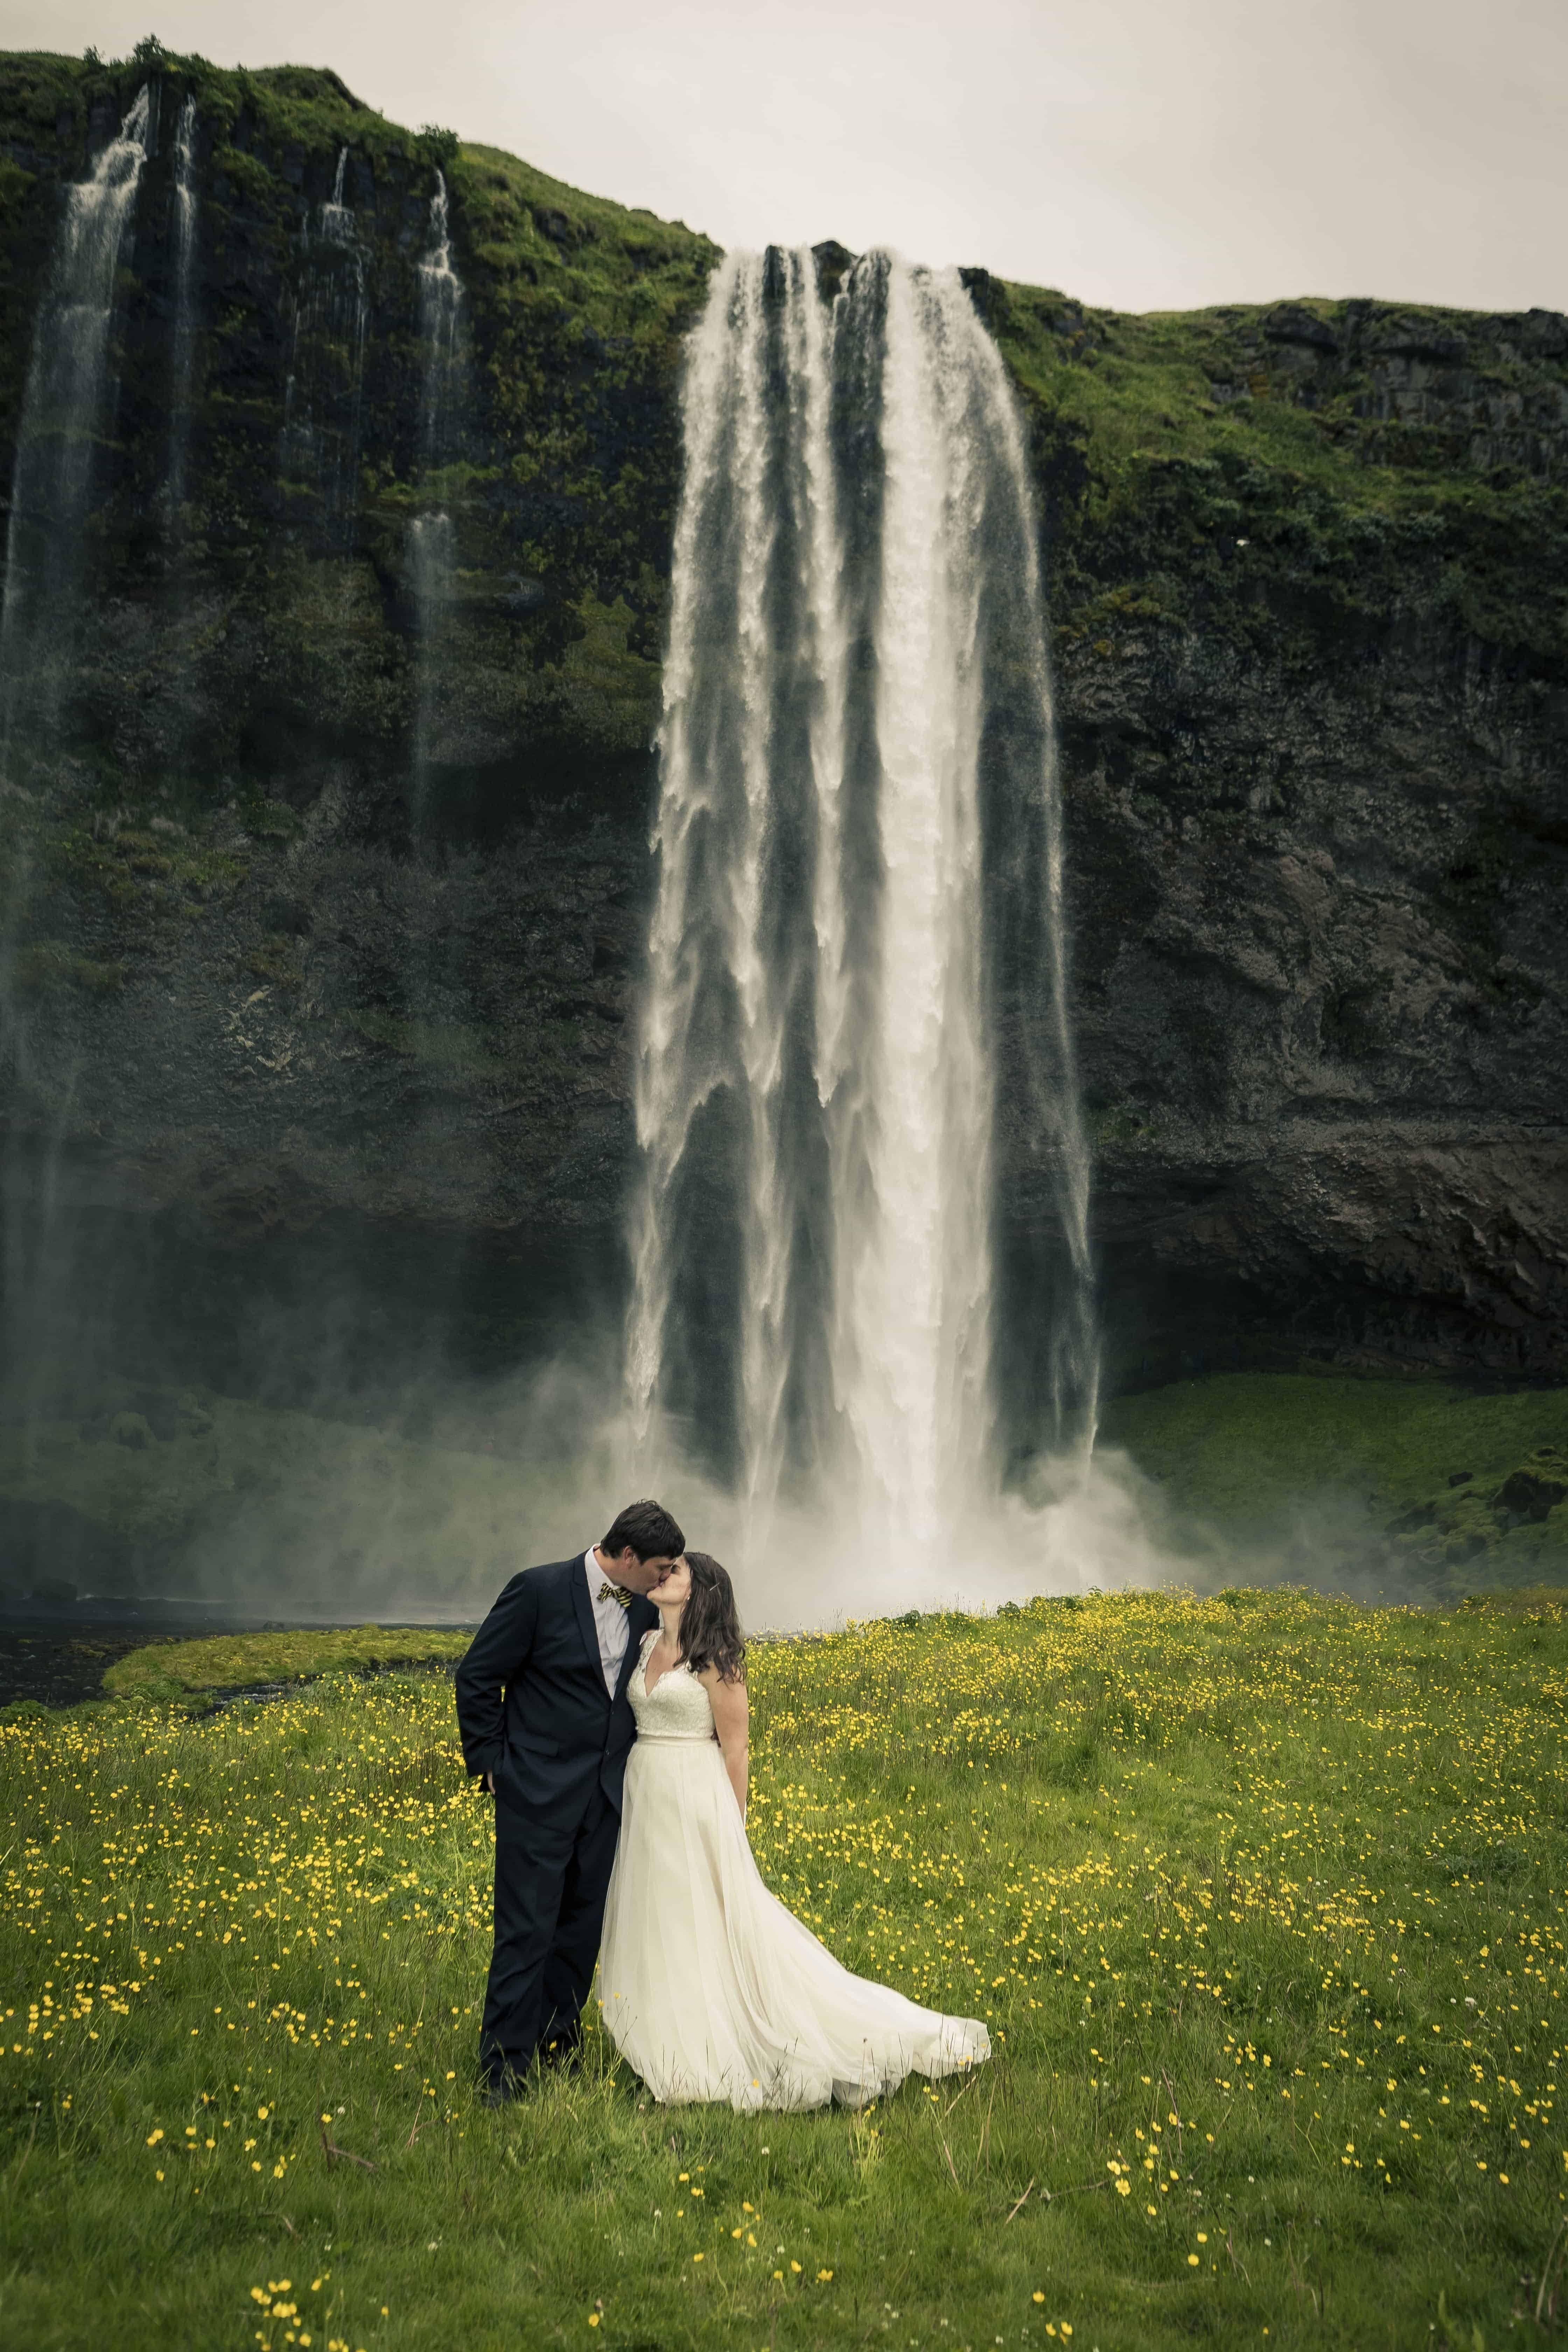 21439 1247 - Luxury Wedding Gallery